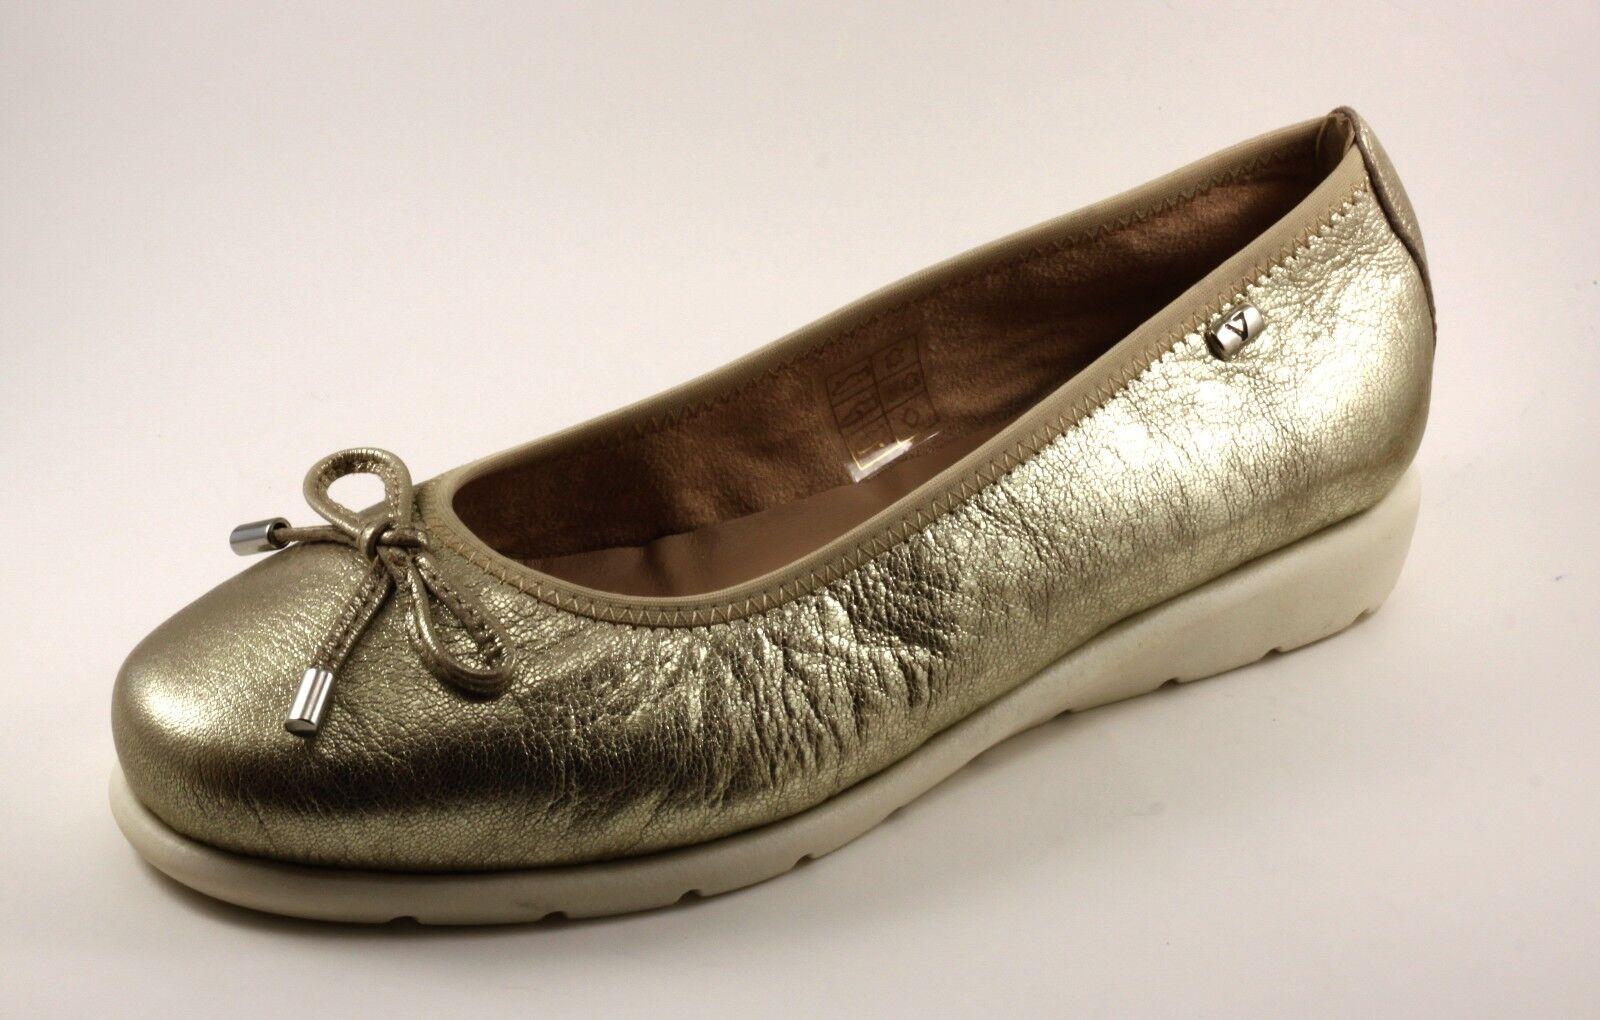 VALLEverde VALLEverde VALLEverde zapatos mujer BALLERINE ESTIVE IN PELLE oro PLATINO MODA CONFORT n. 38  venta de ofertas